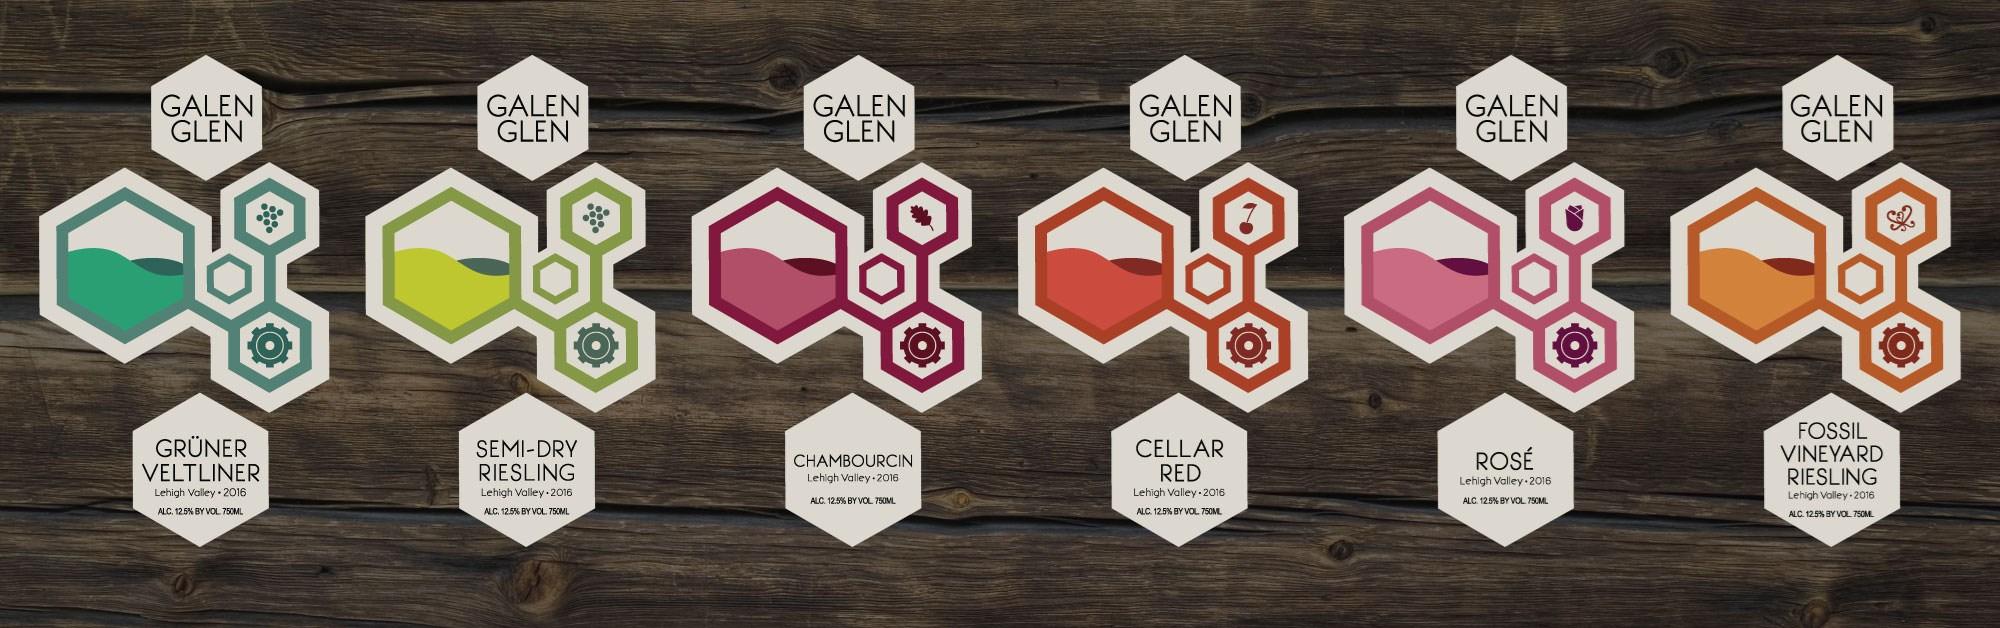 Galen Glen Labels